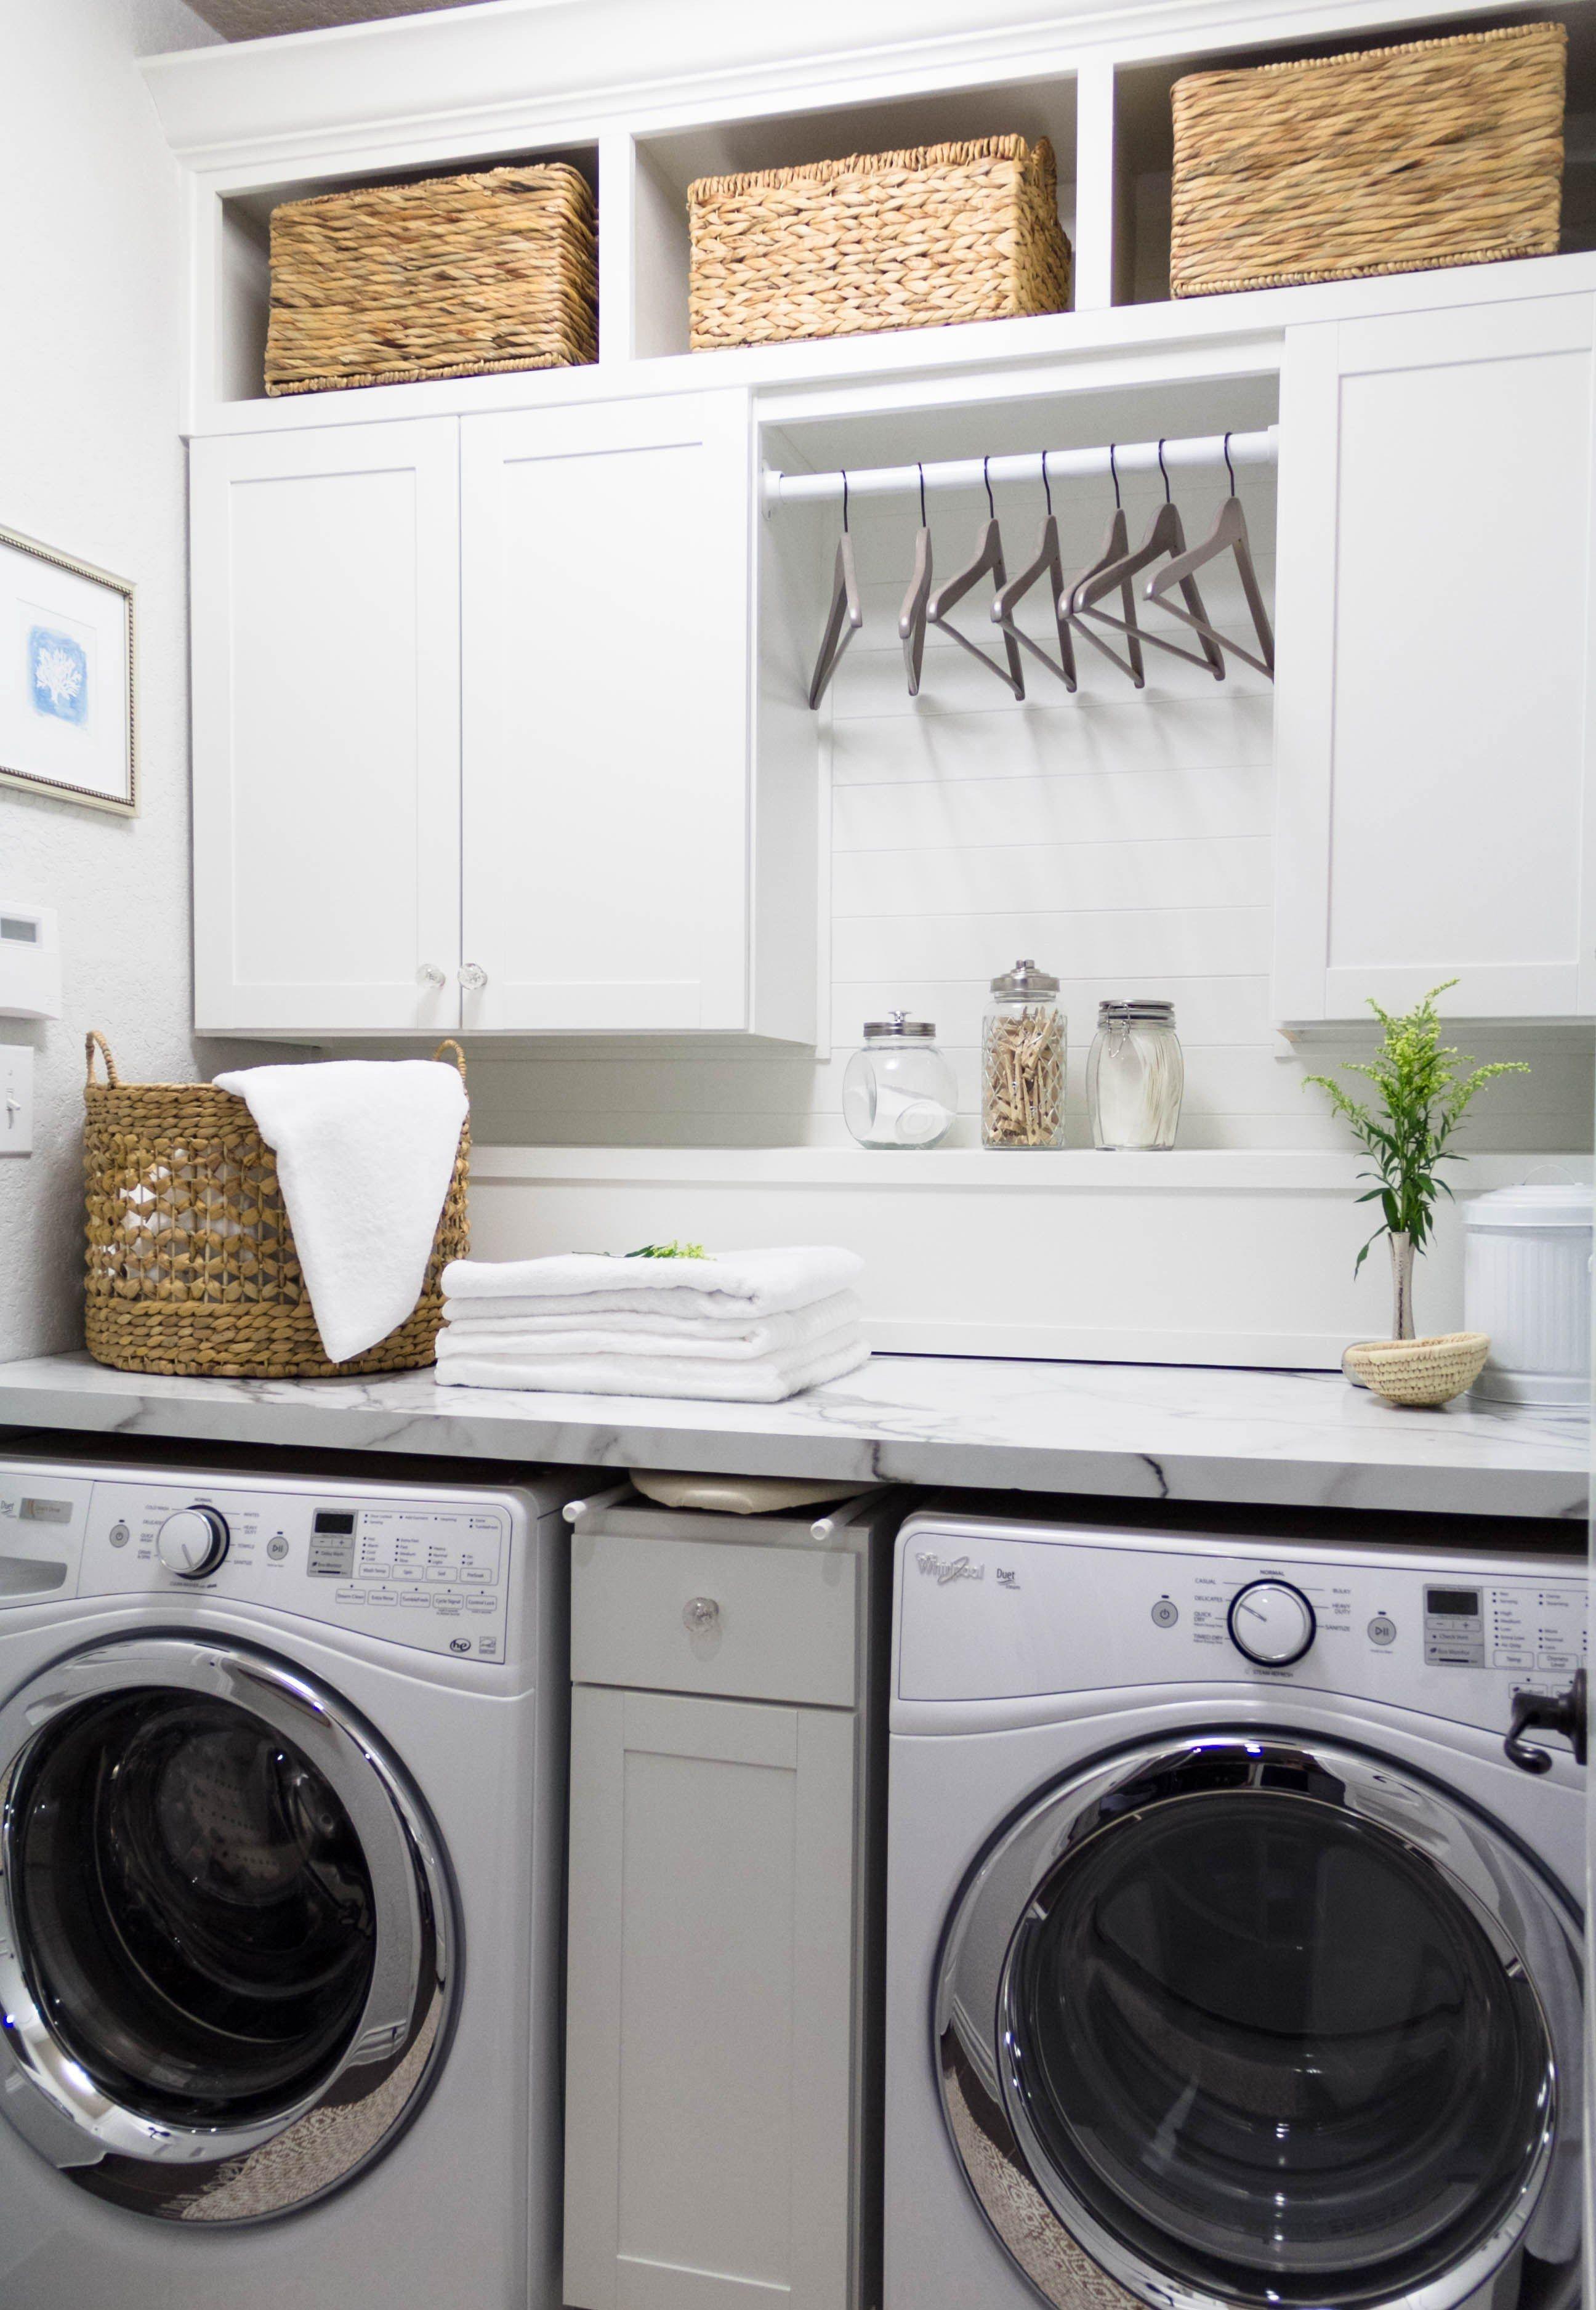 Basement laundry room ideas DIY design space saving dream homes how